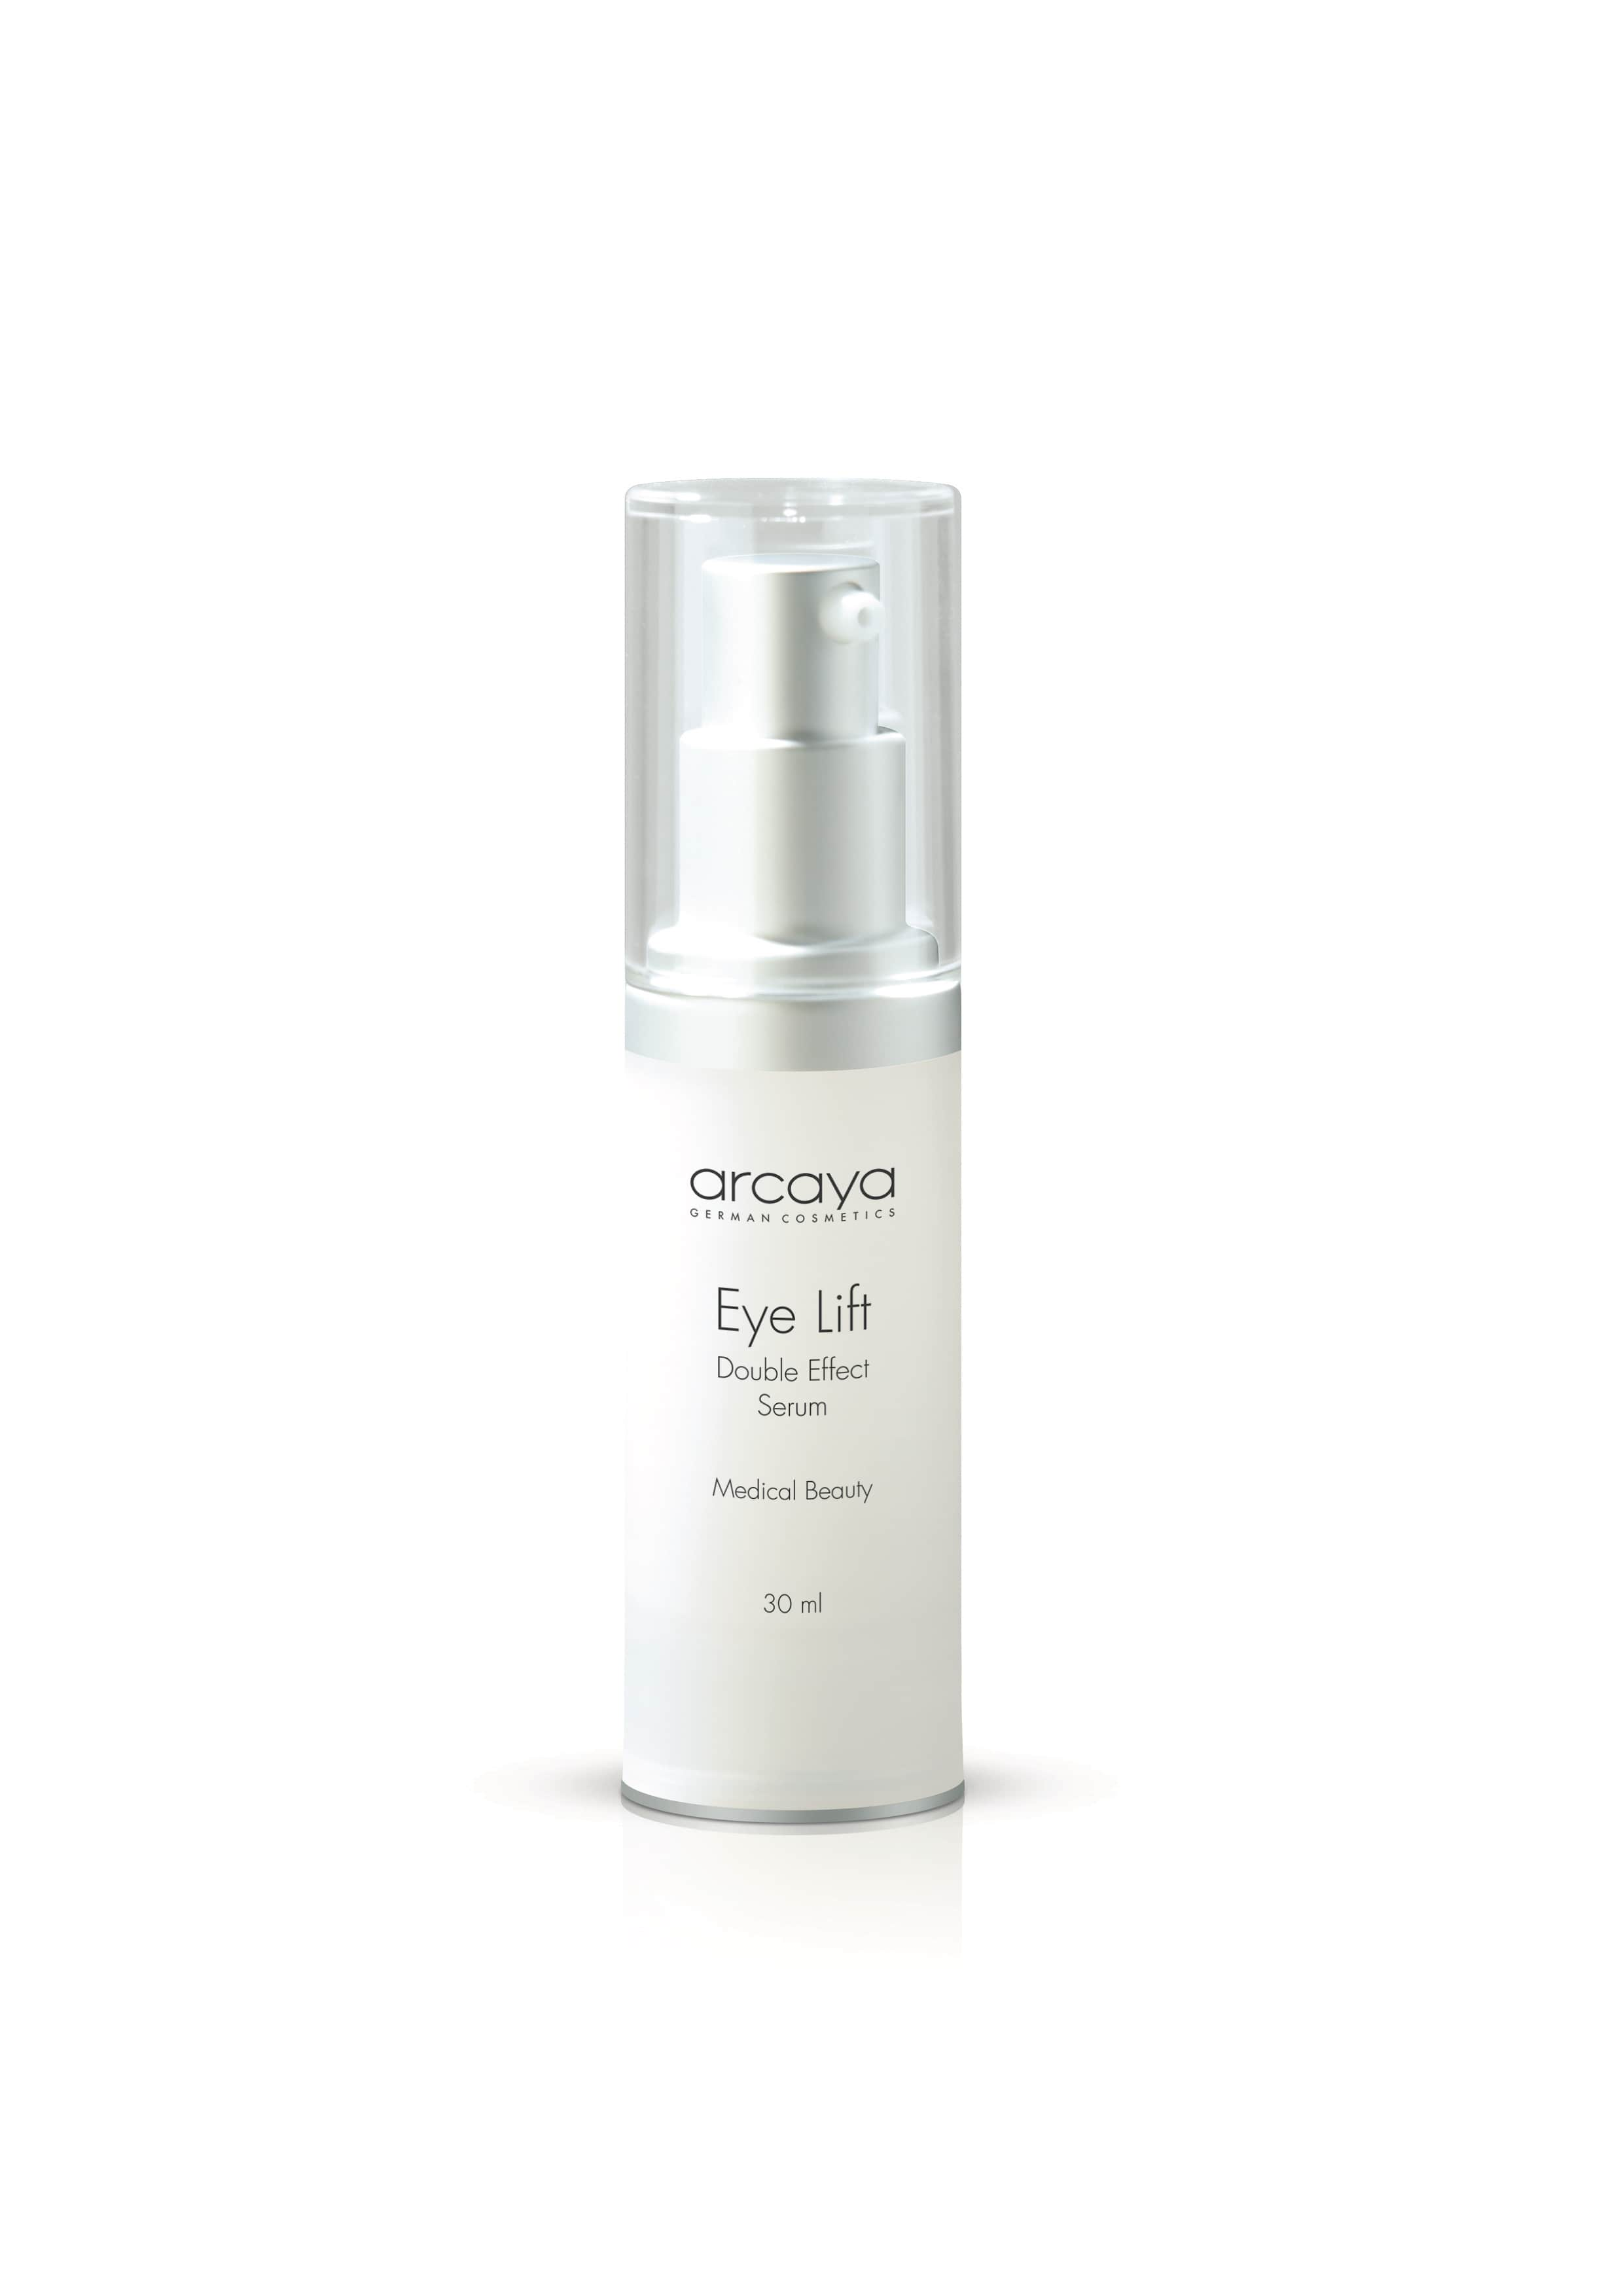 Arcaya Eye Lift Double Effect Serum Συμπυκνωμένο?ς? Ορός? για την περιοχή των Ματιών, 30ml